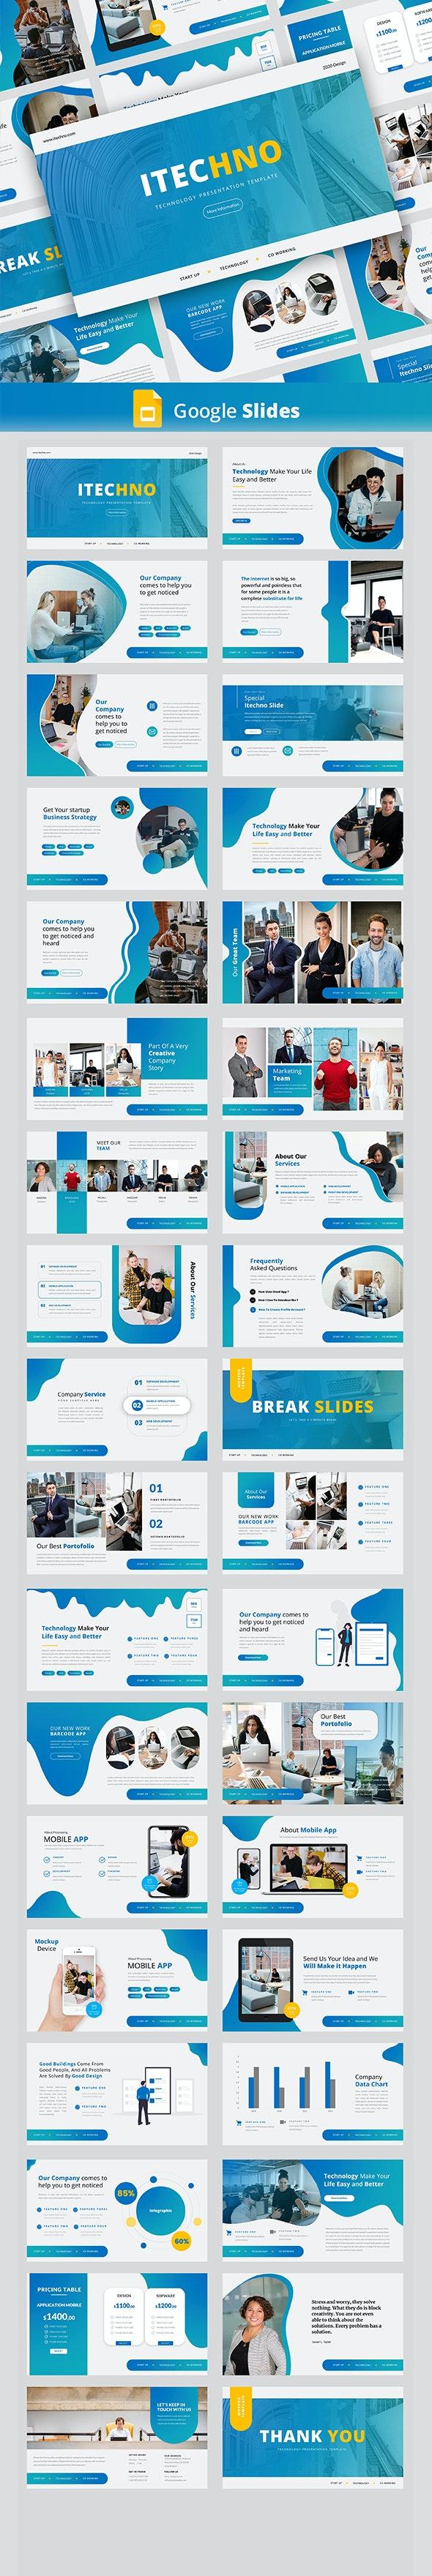 Itechno – Creative Business Google Slides Template - Google Slides Presentation Templates